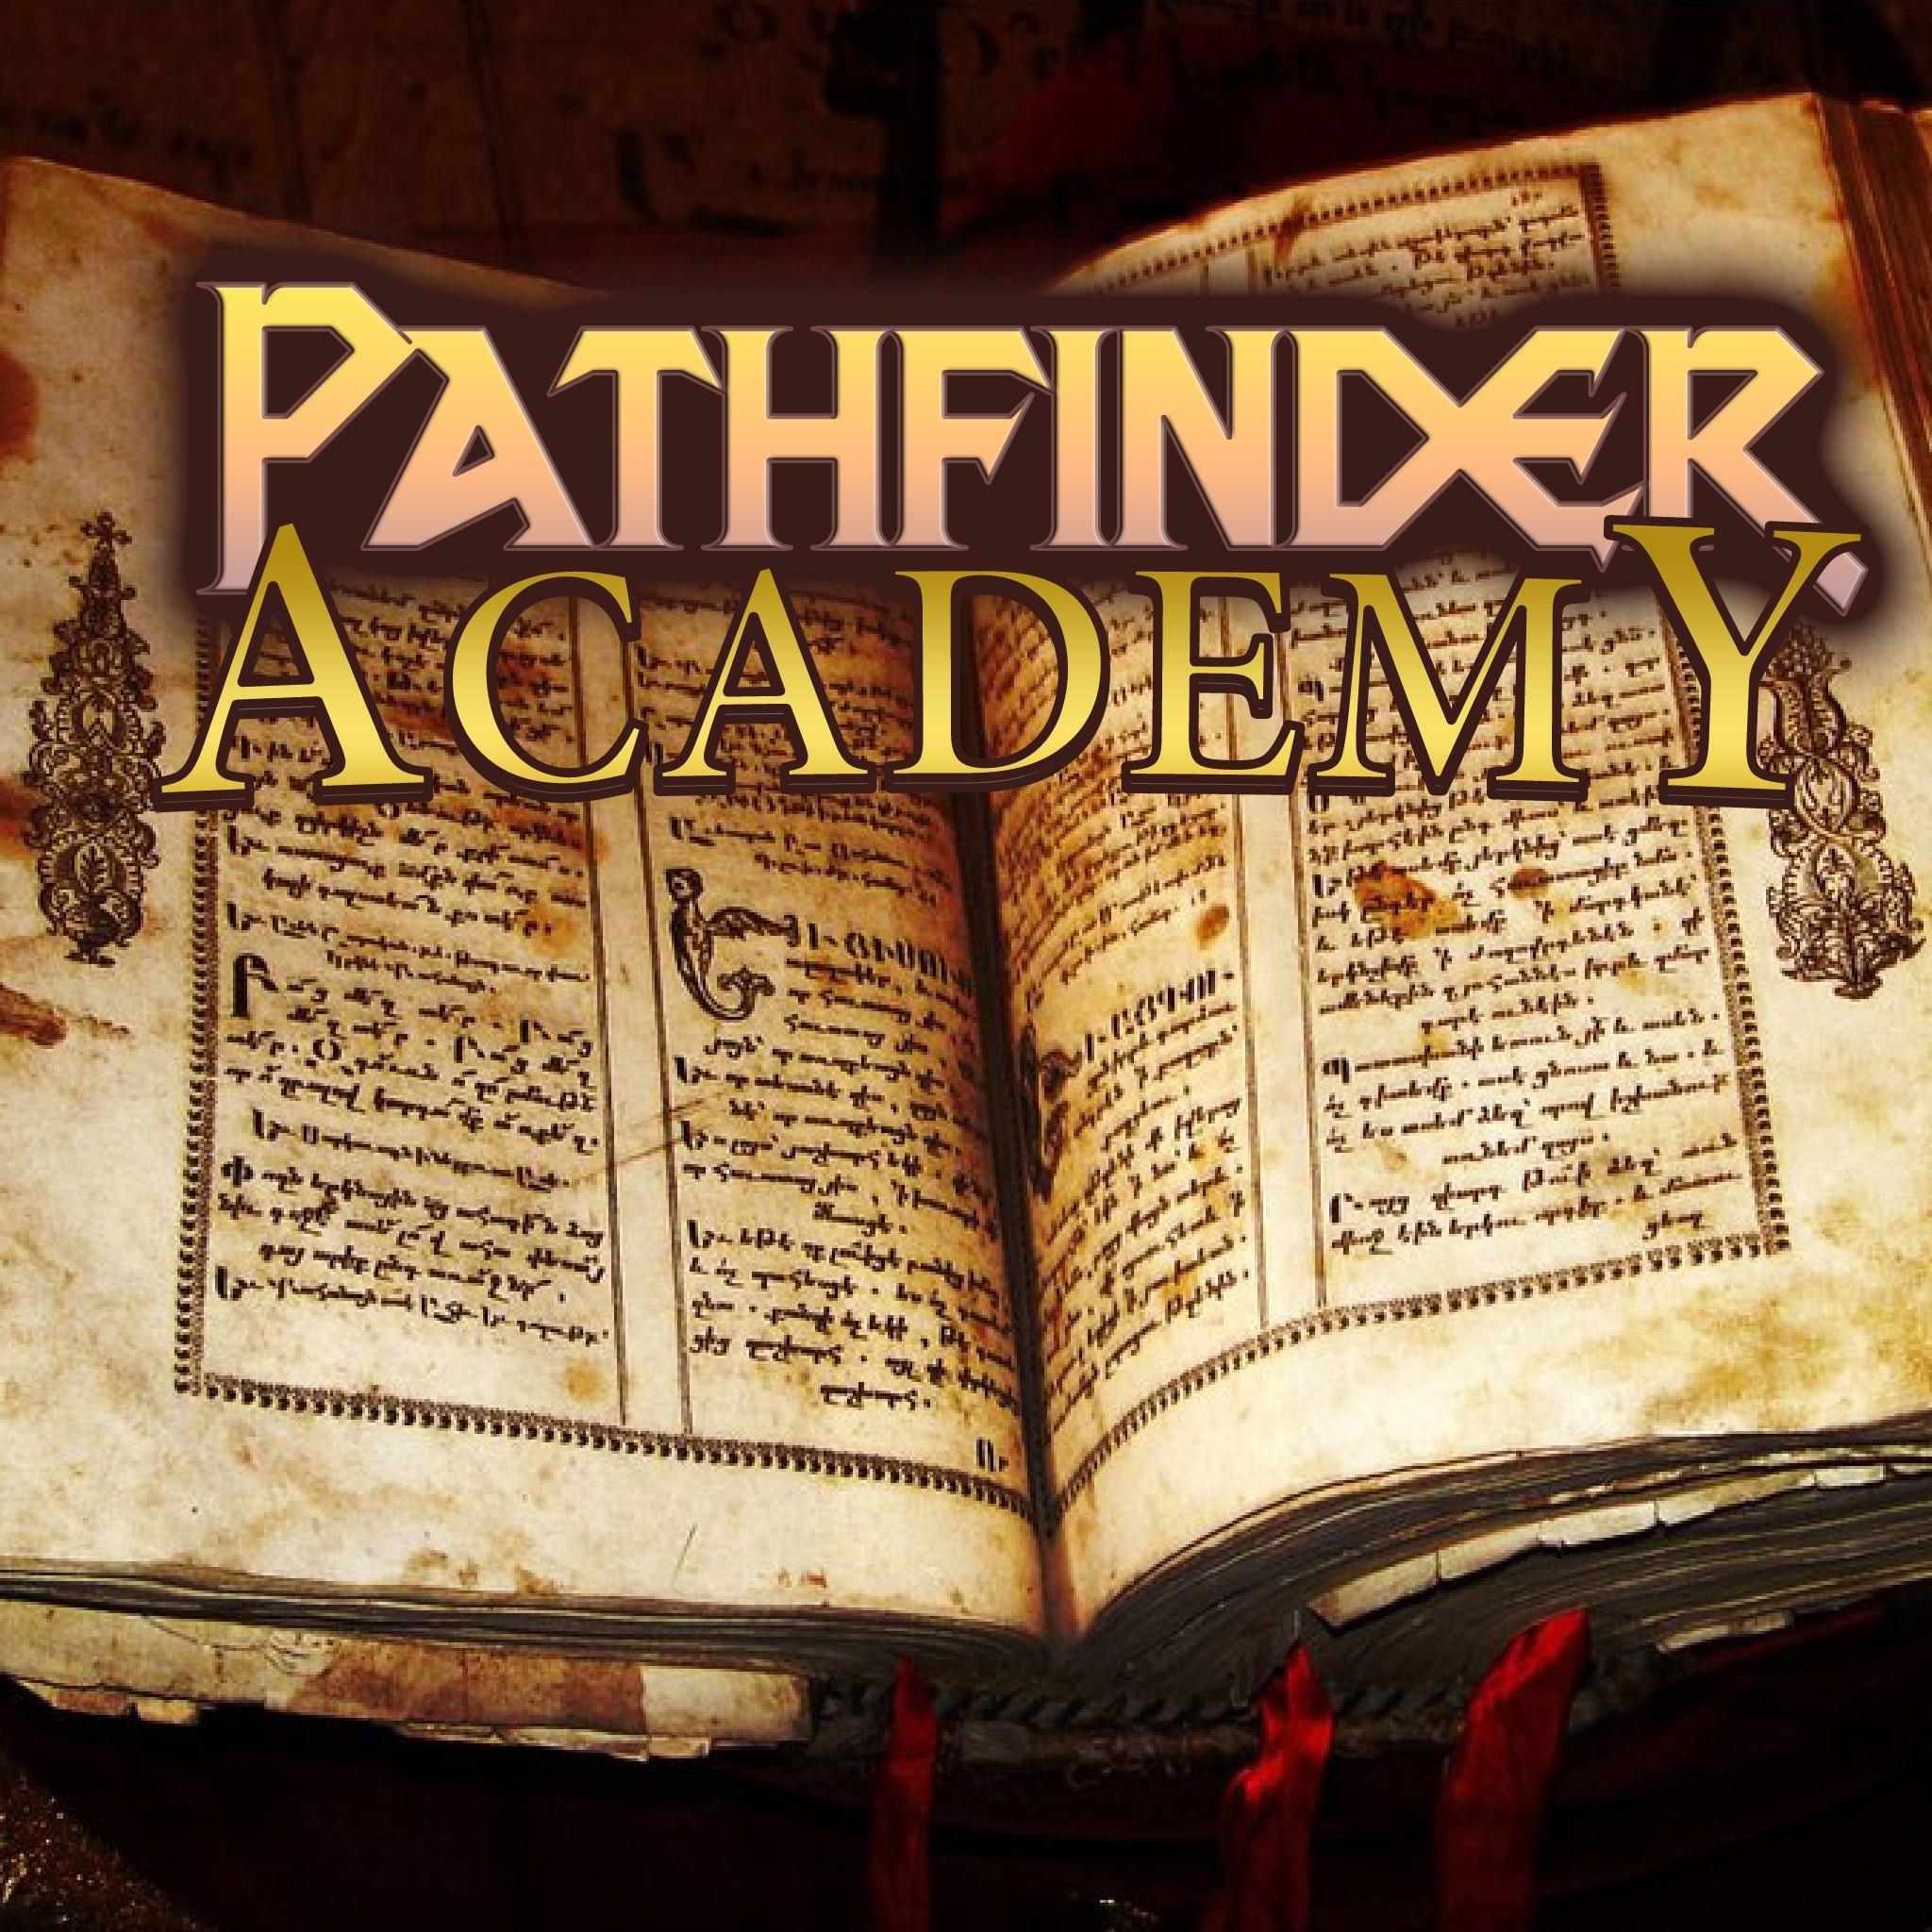 Pathfinder Academy